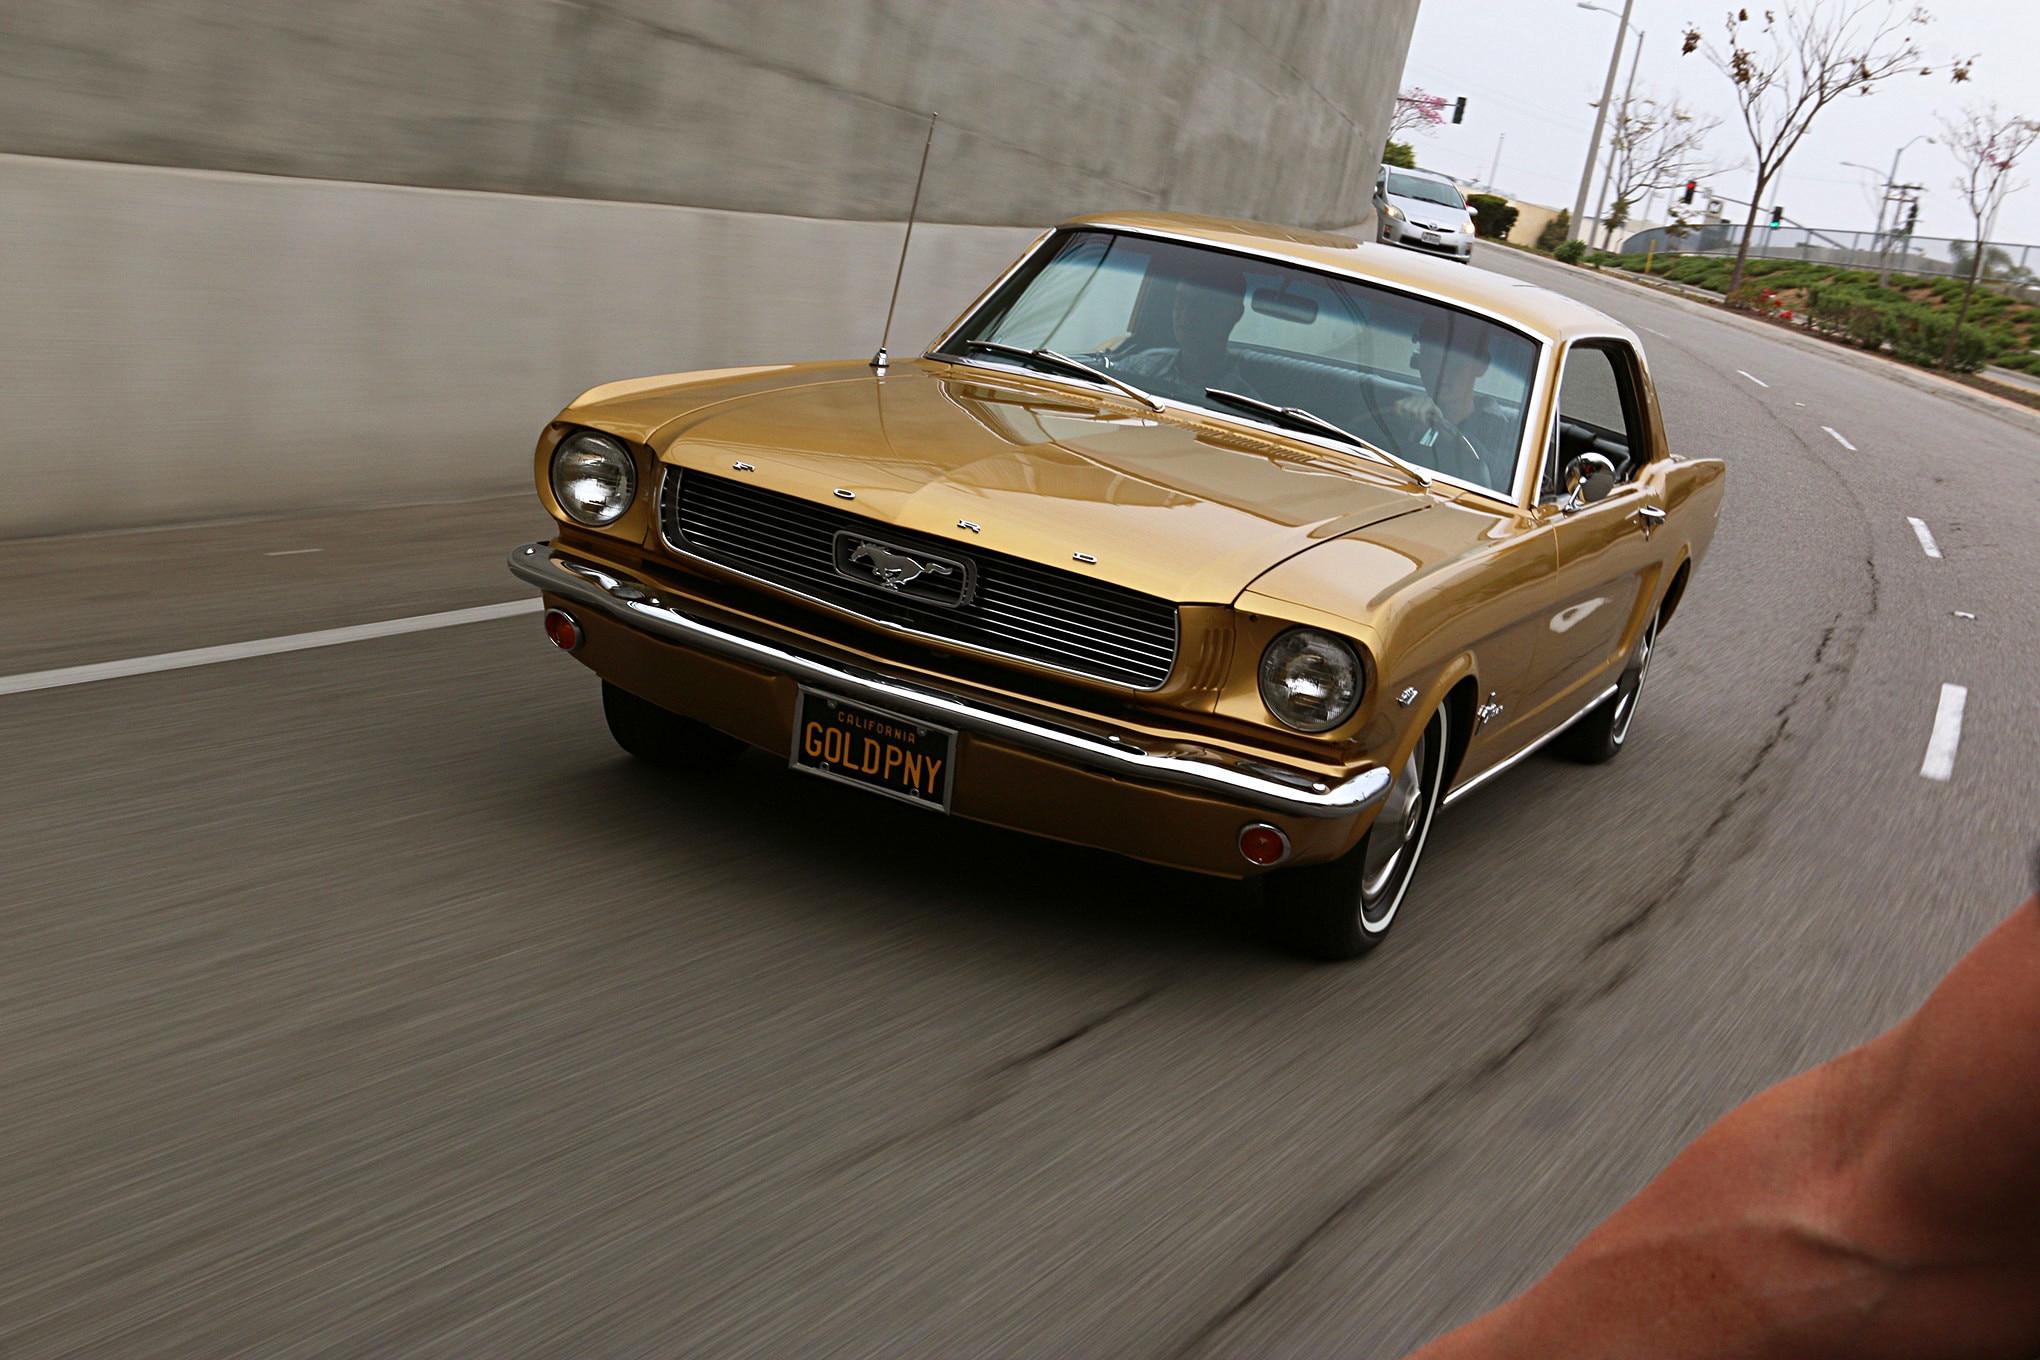 Golden Anniversary Mustang 027